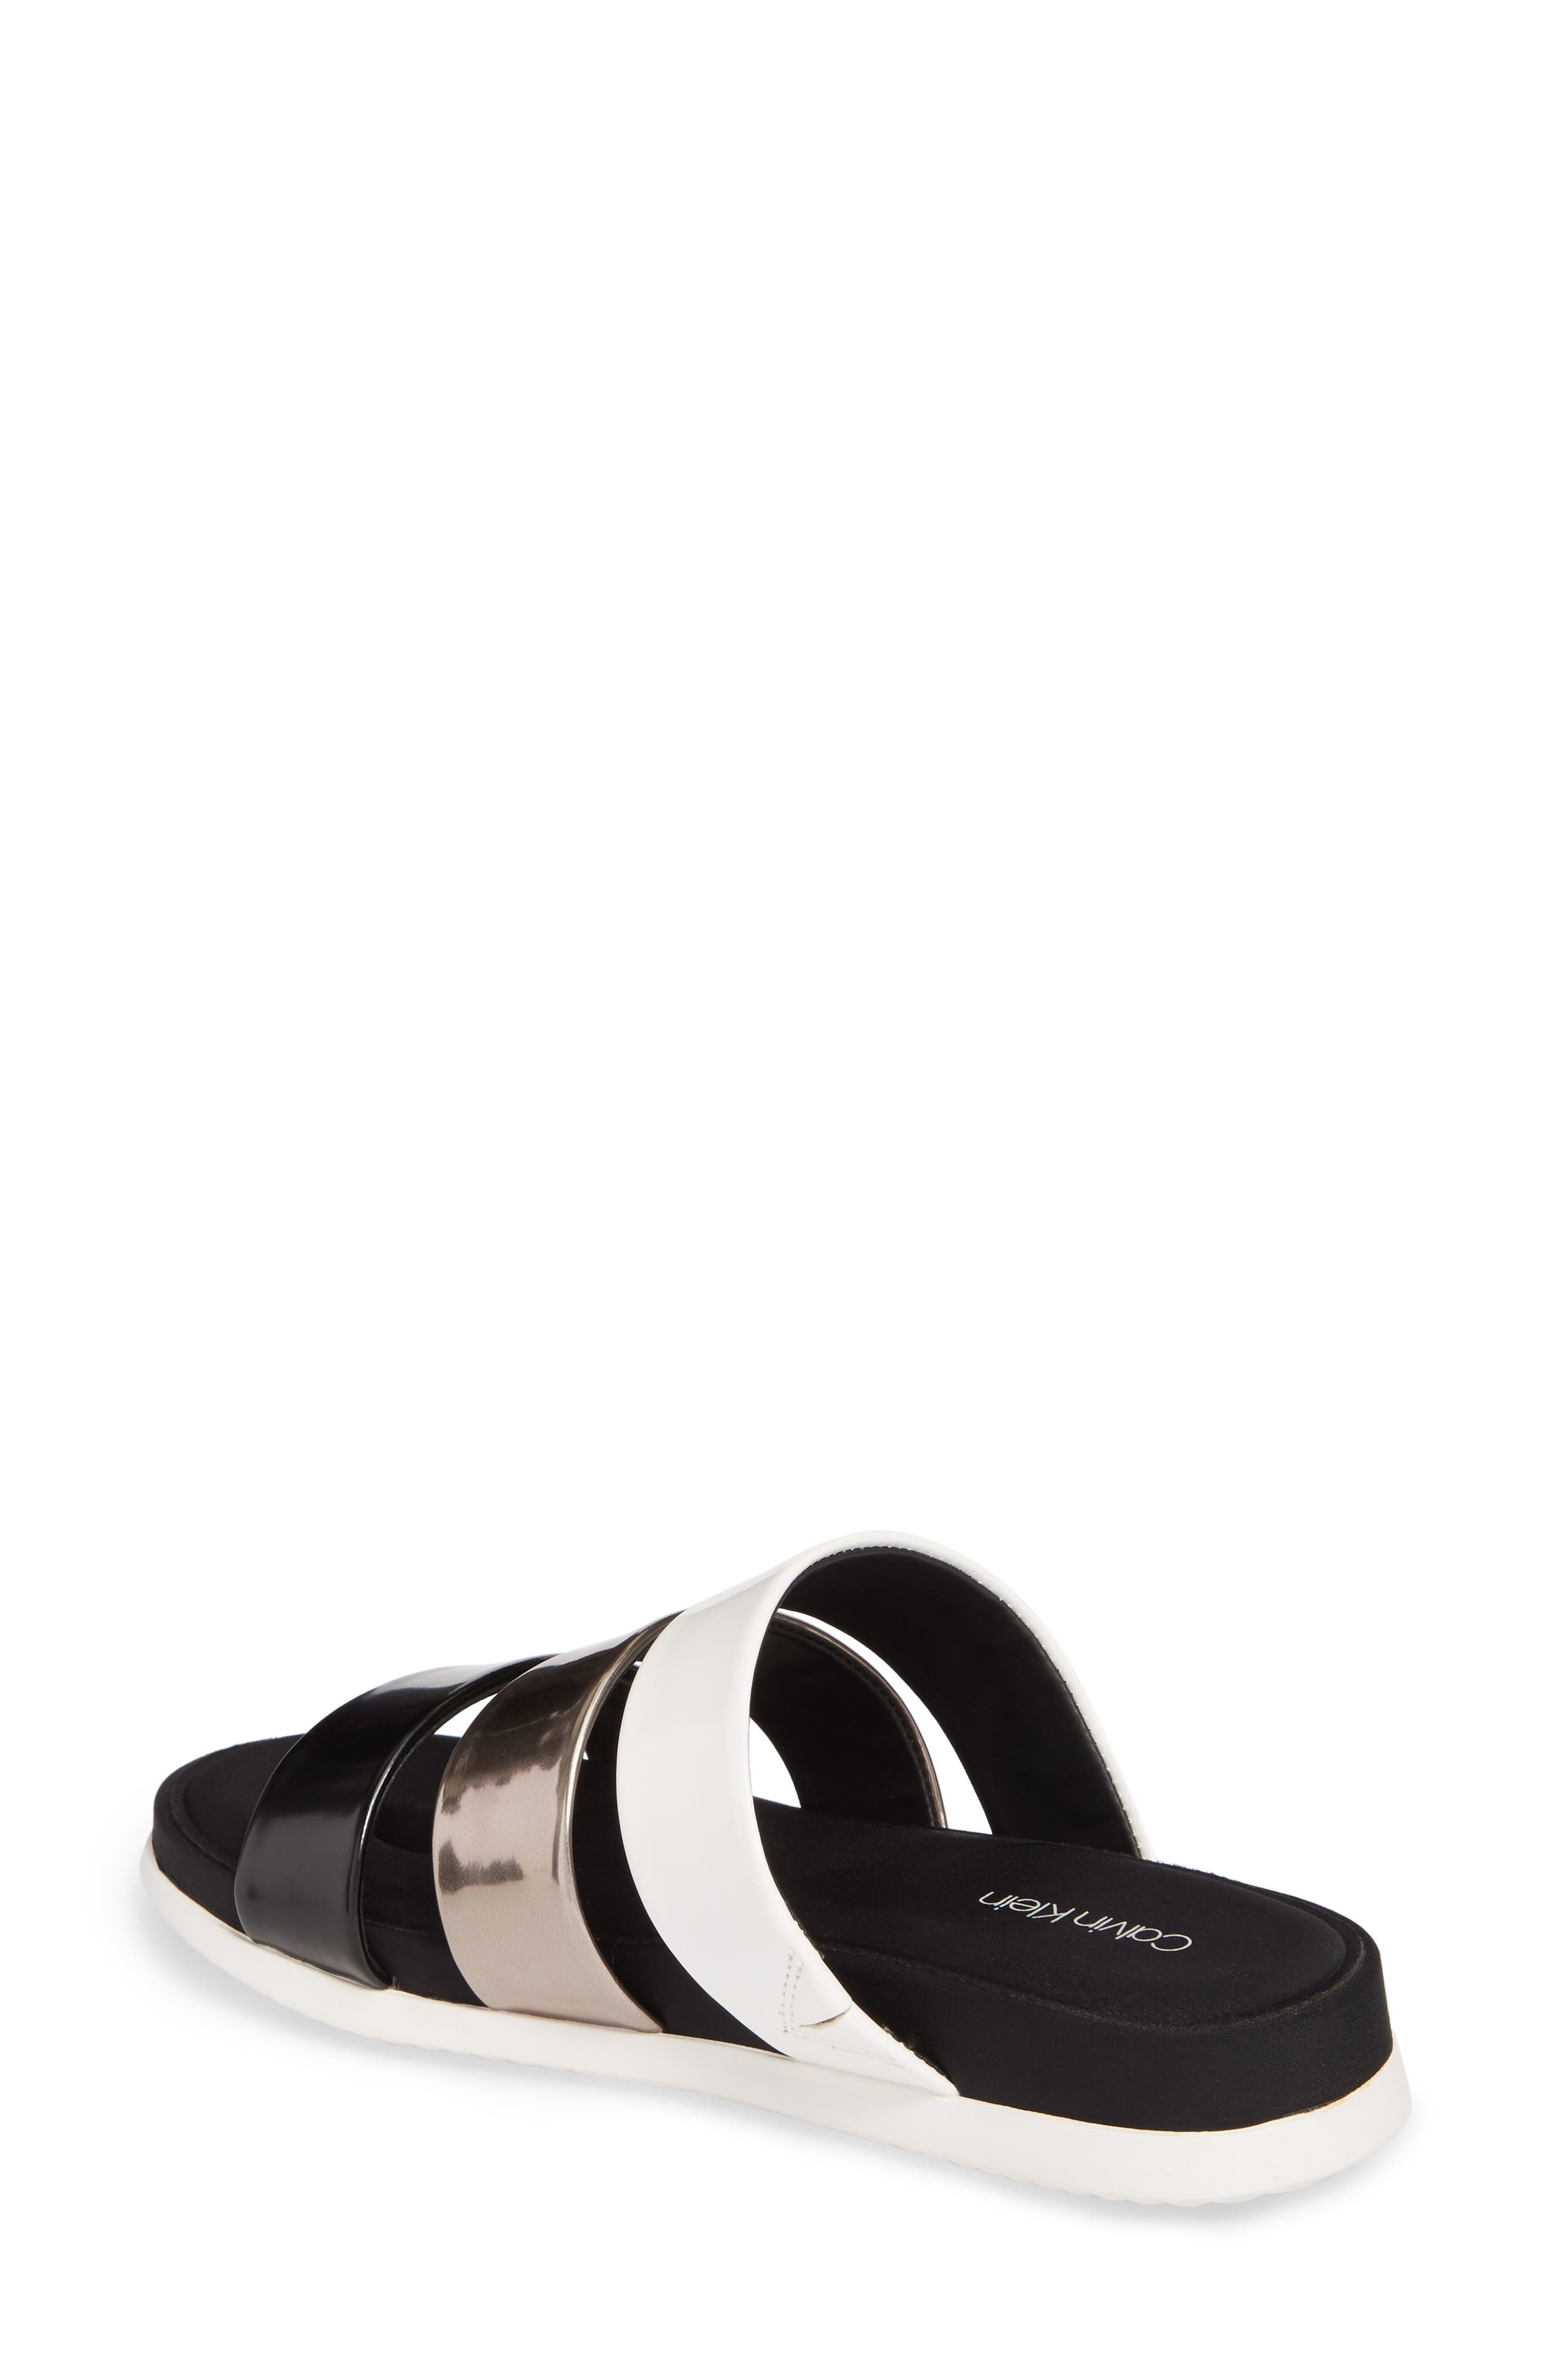 Dalana Slide Sandal,                             Alternate thumbnail 2, color,                             Black/ Pewter Faux Leather